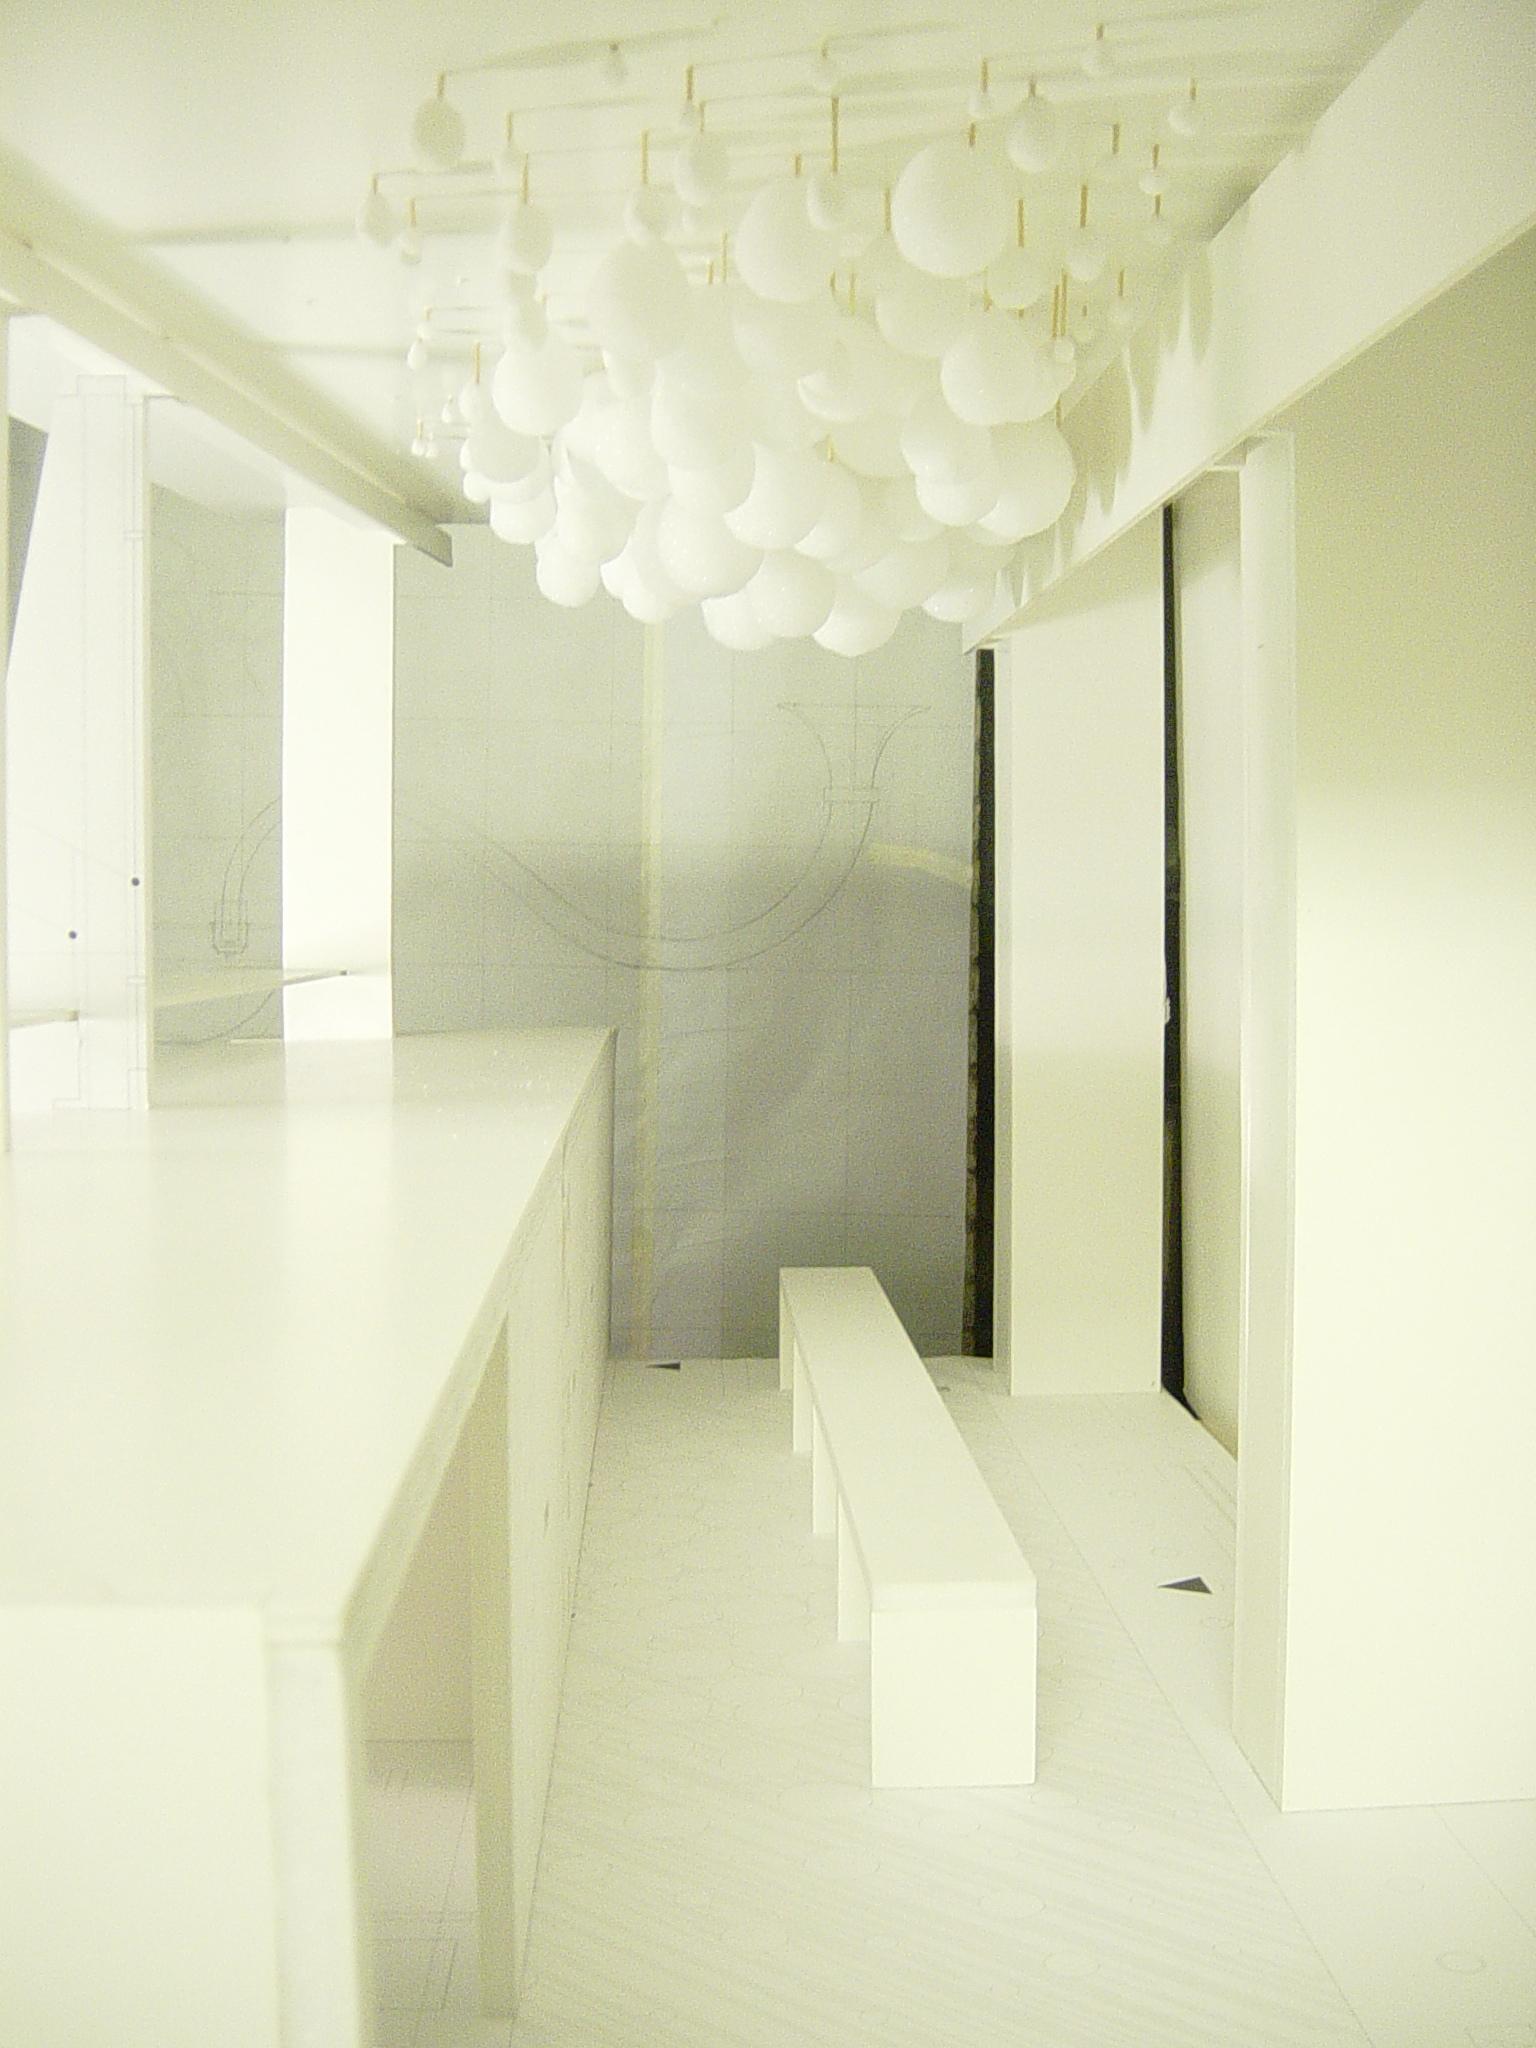 sei+studio+custom+glass+design+nyc+w+hotel+seoul+6.JPG